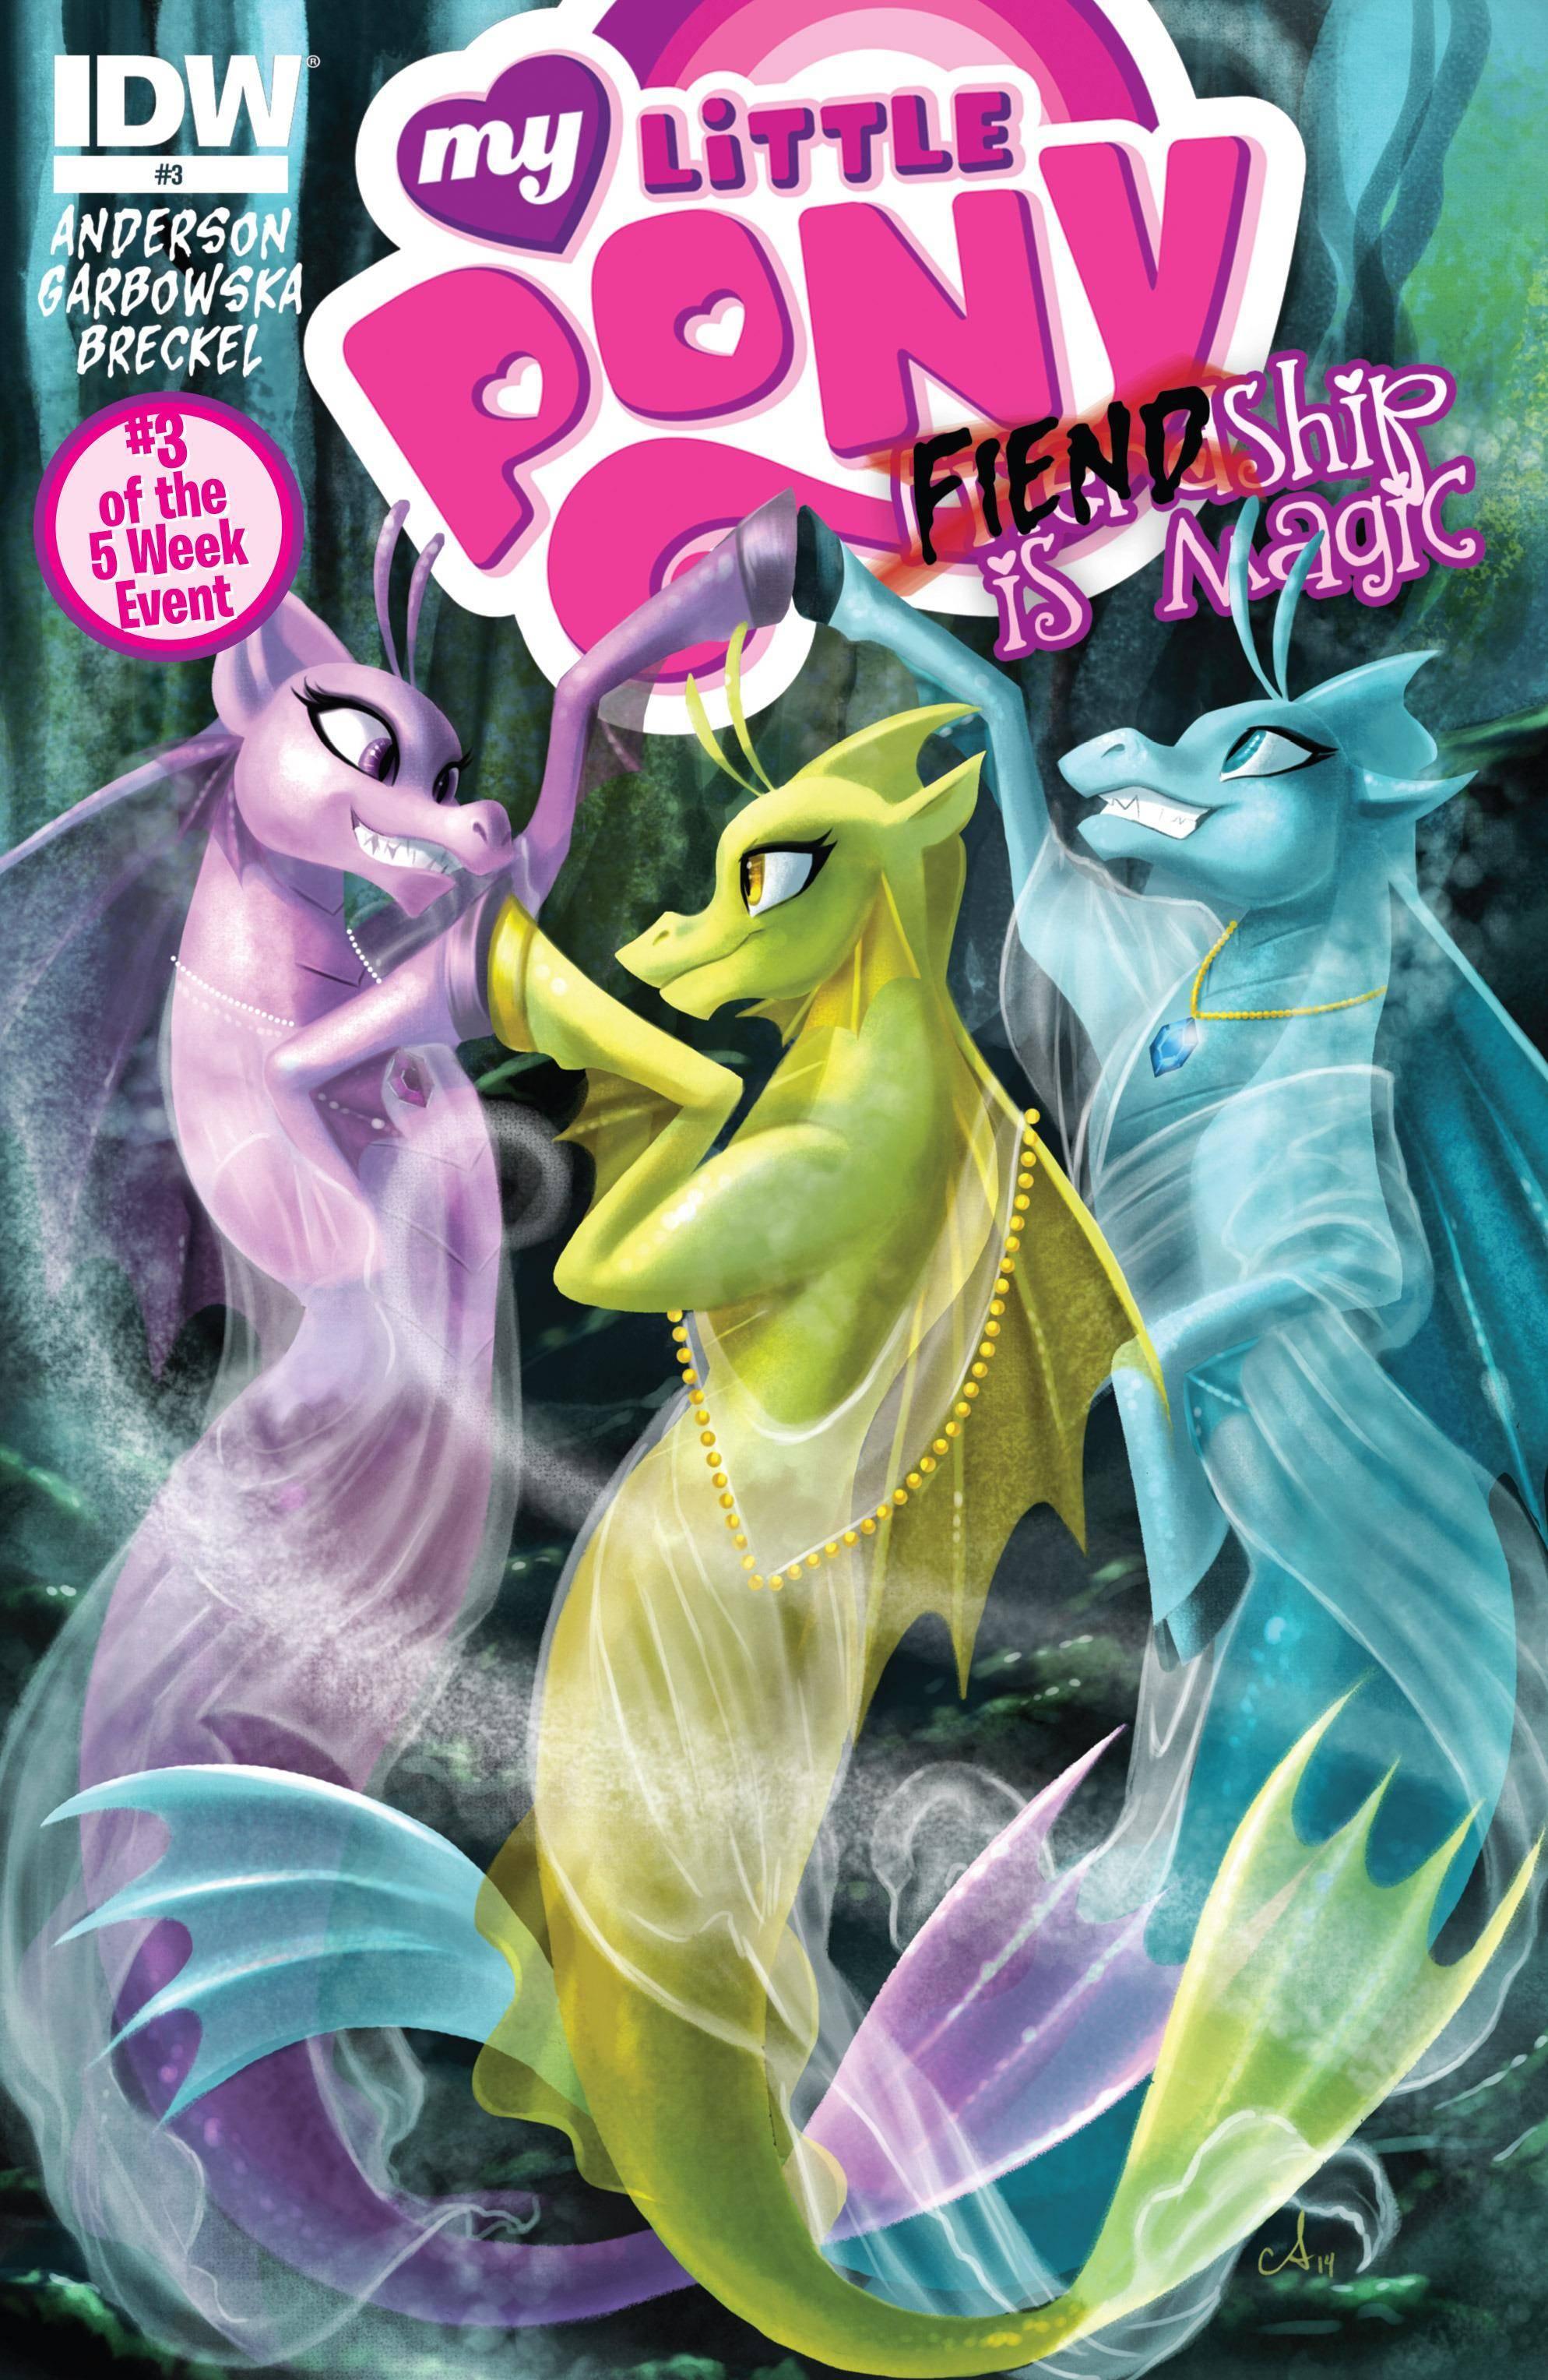 My Little Pony- FIENDship is Magic 003 - Sirens 2015 digital